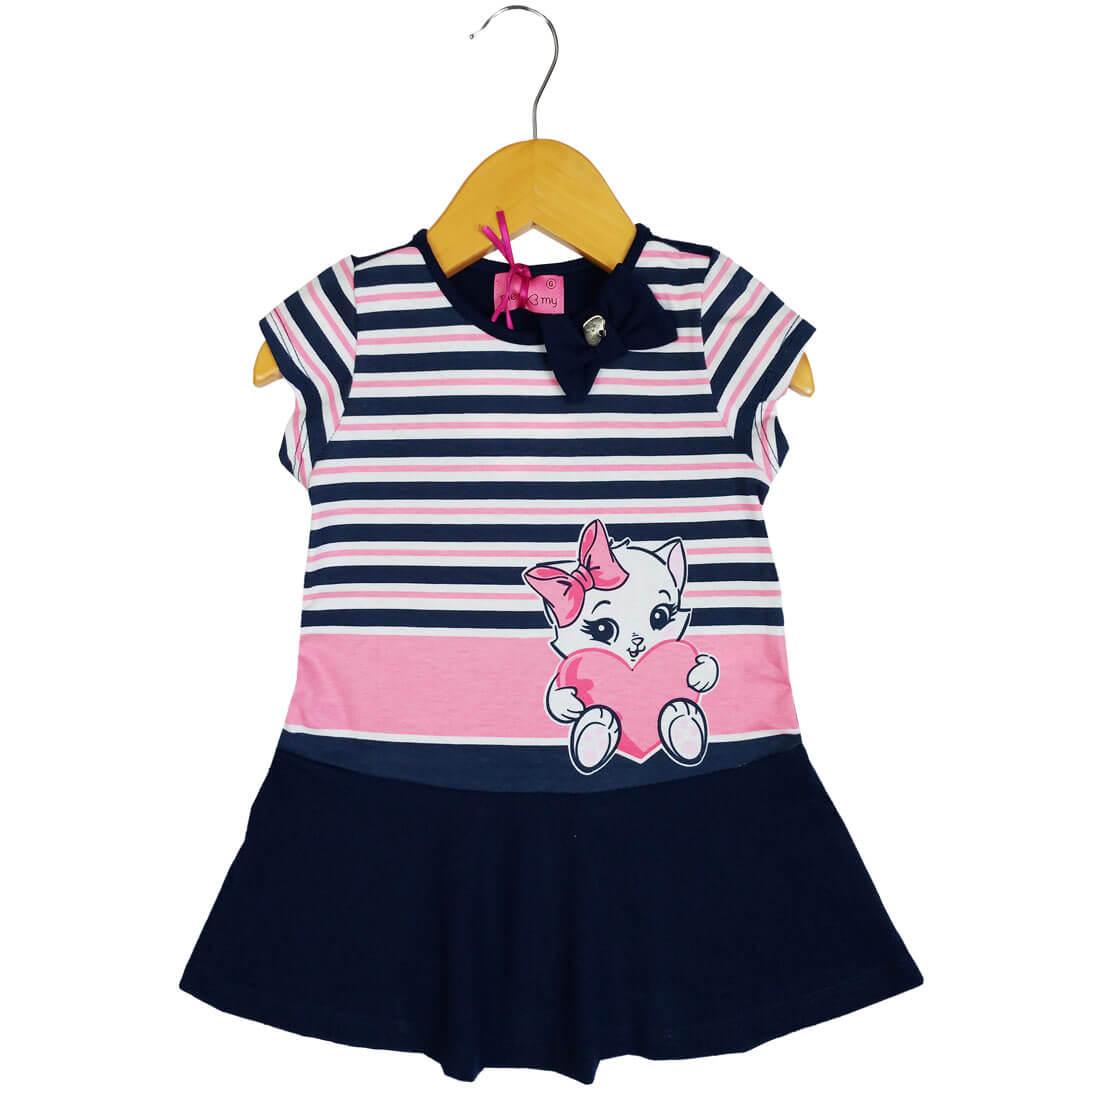 e3270b331 Vestido Turma da Malha Memy - Morebaby Loja Infantil ...